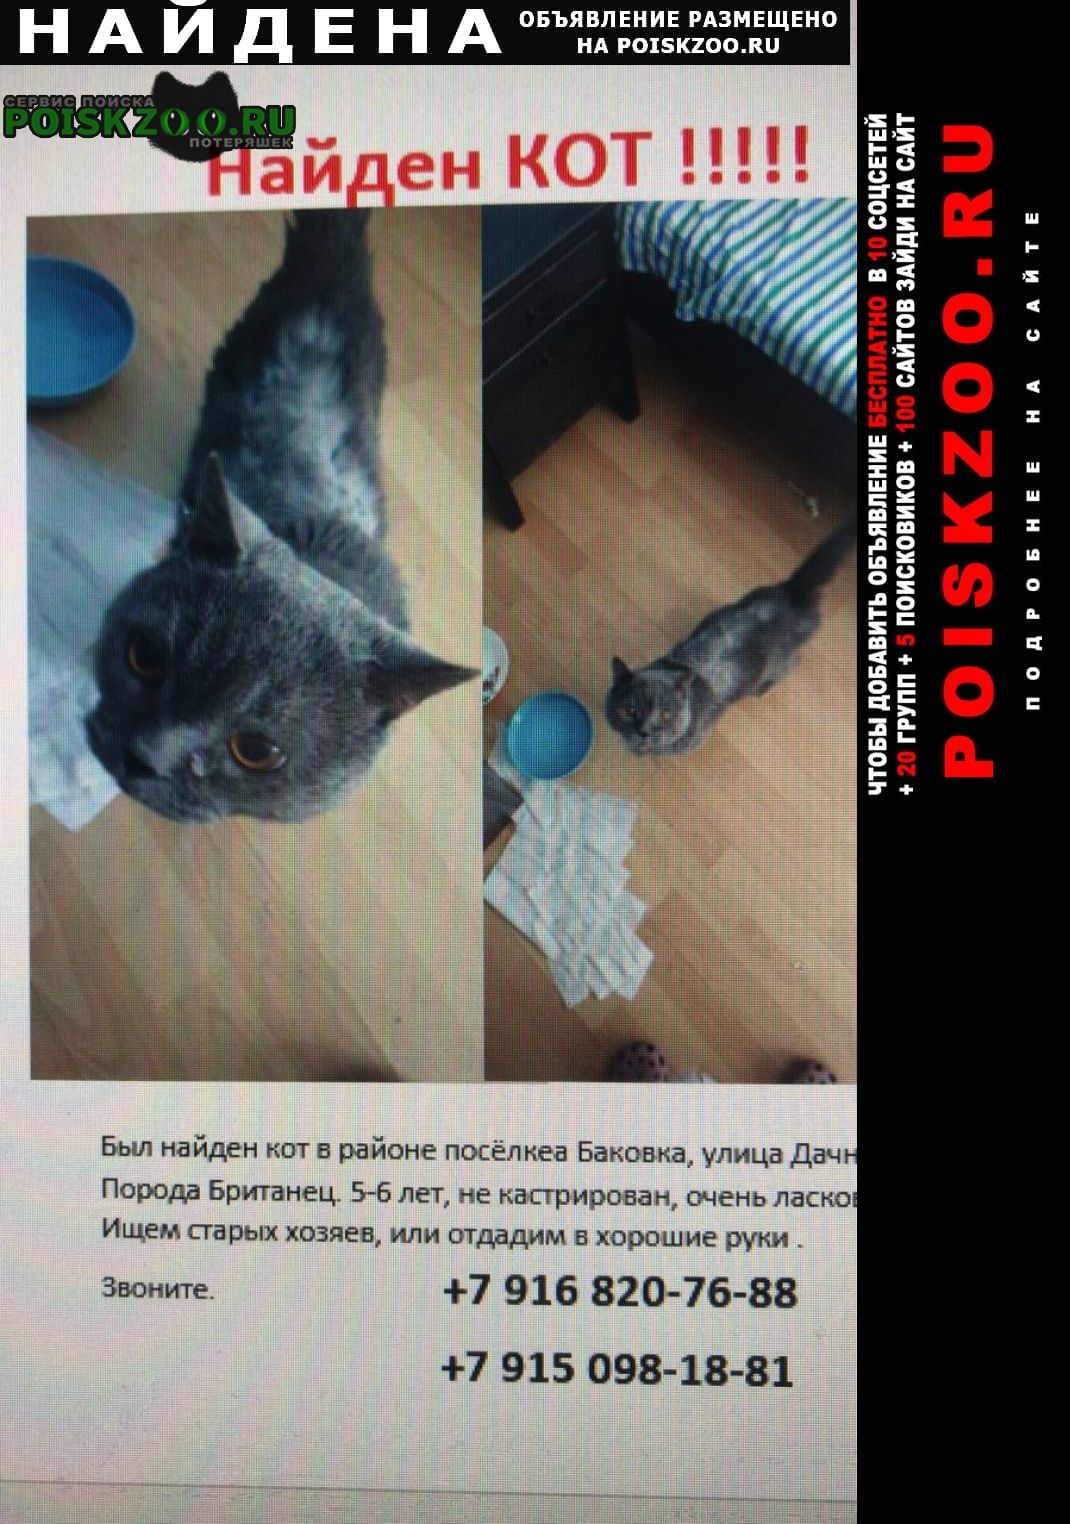 Найден кот британский Одинцово